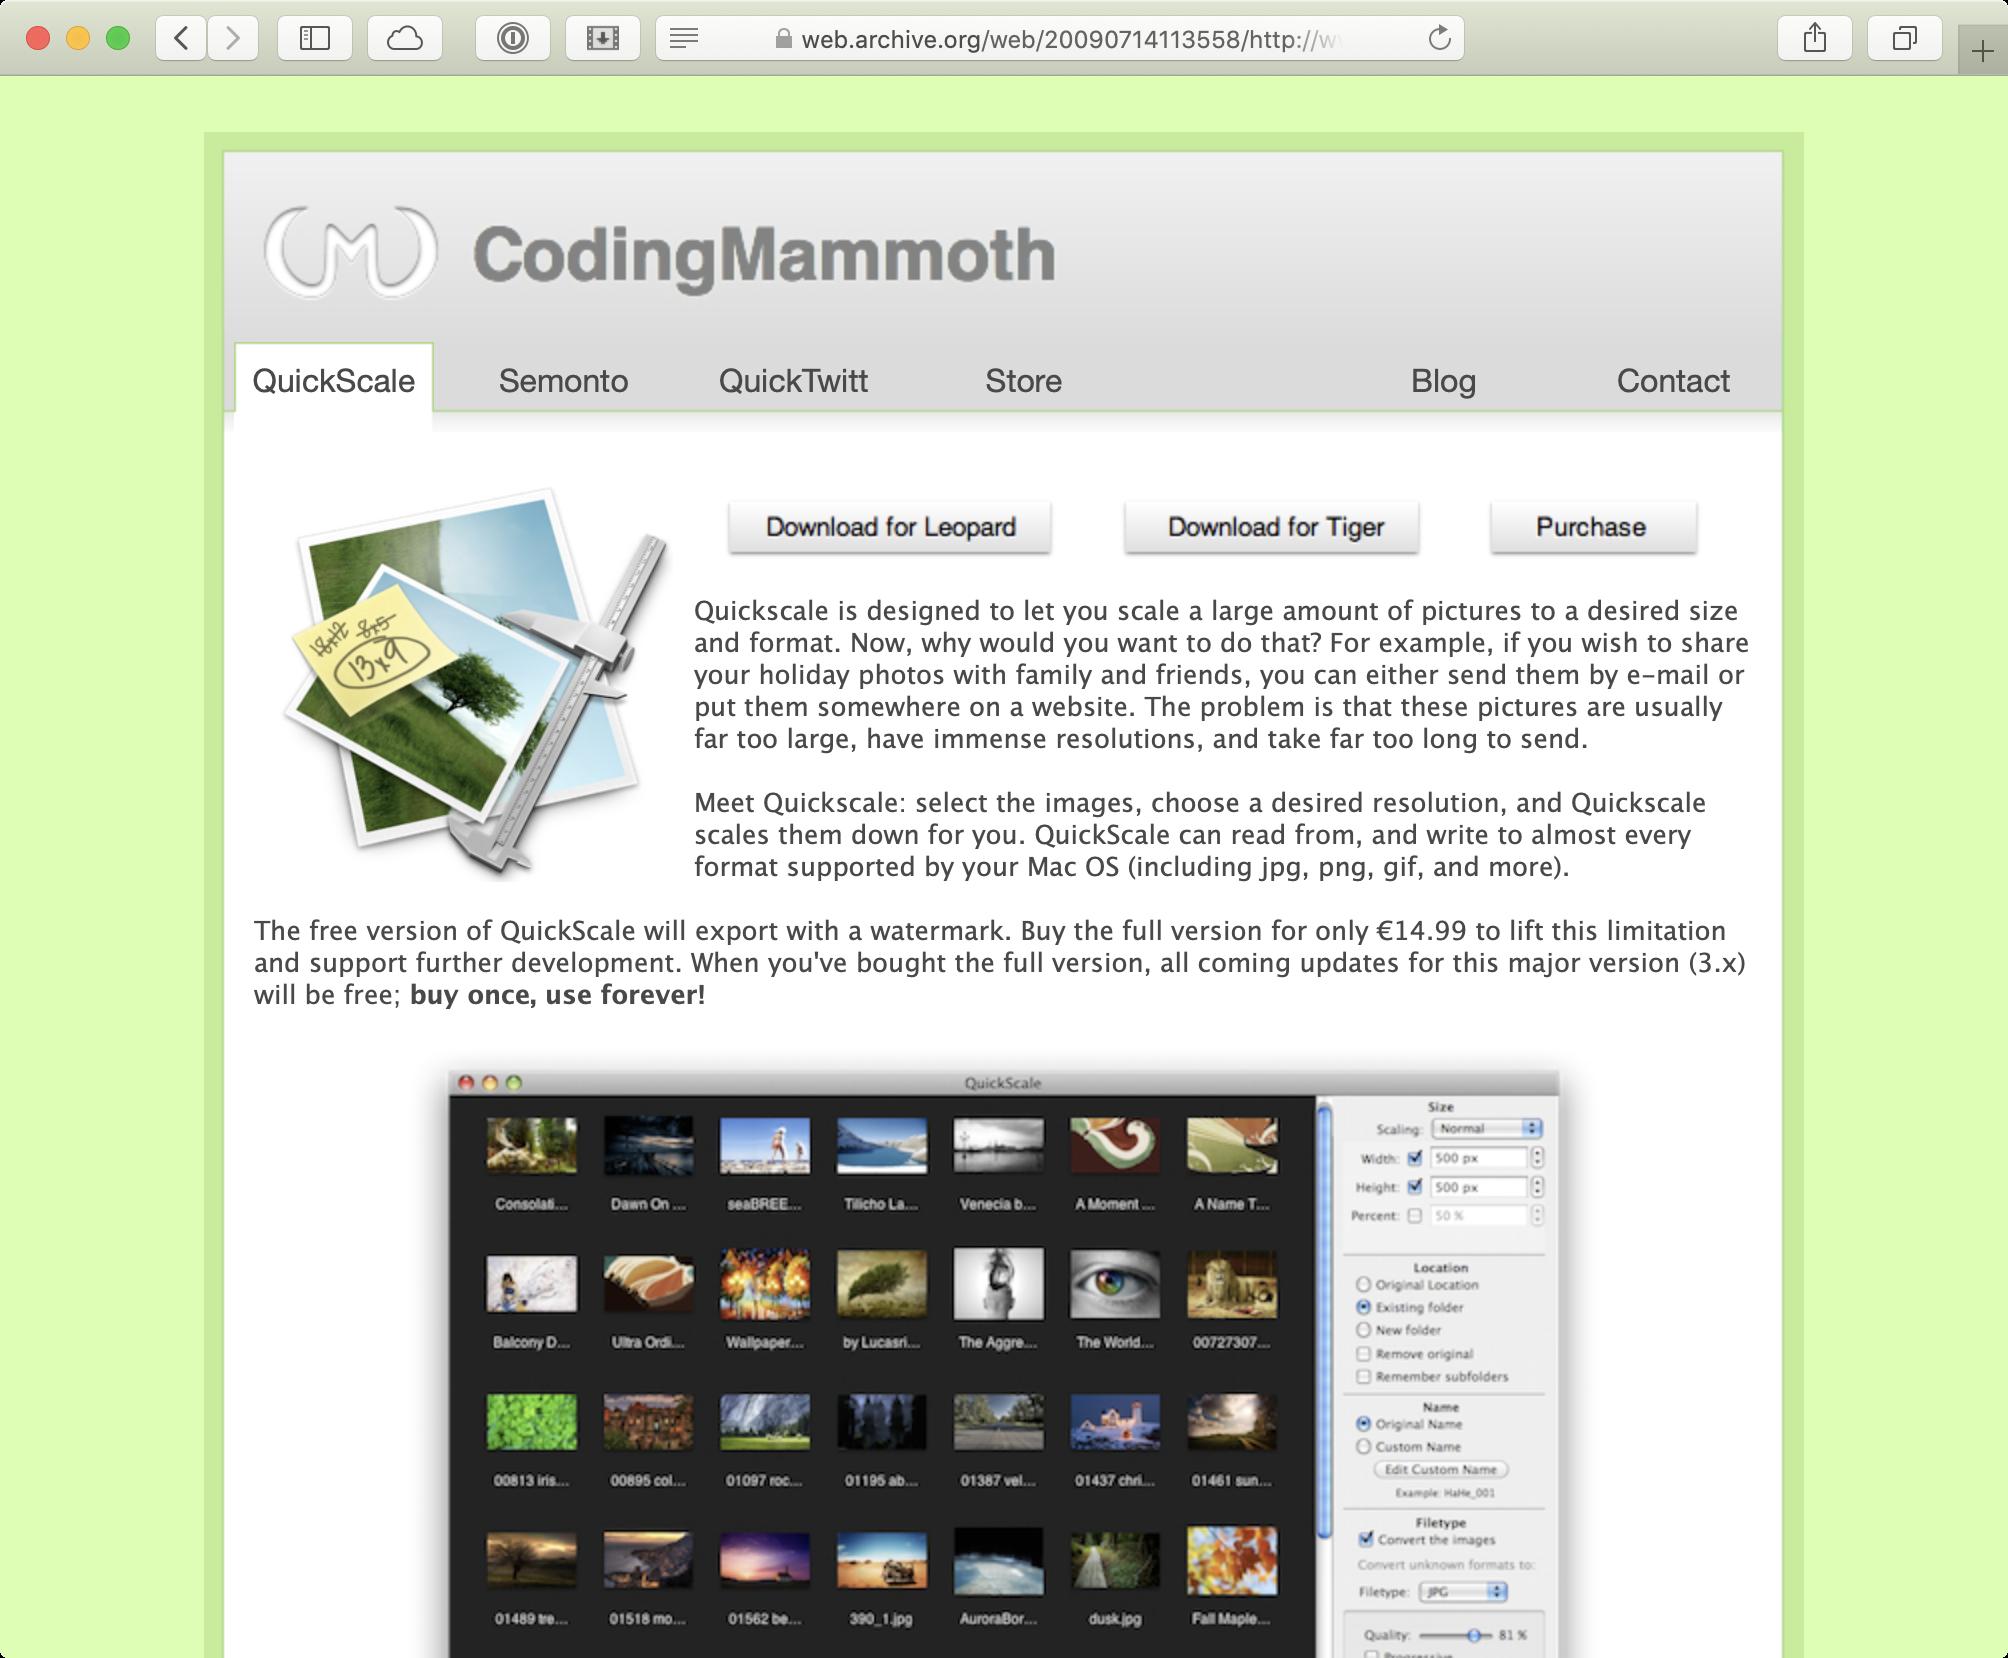 Website Coding Mammoth QuickScale 2009